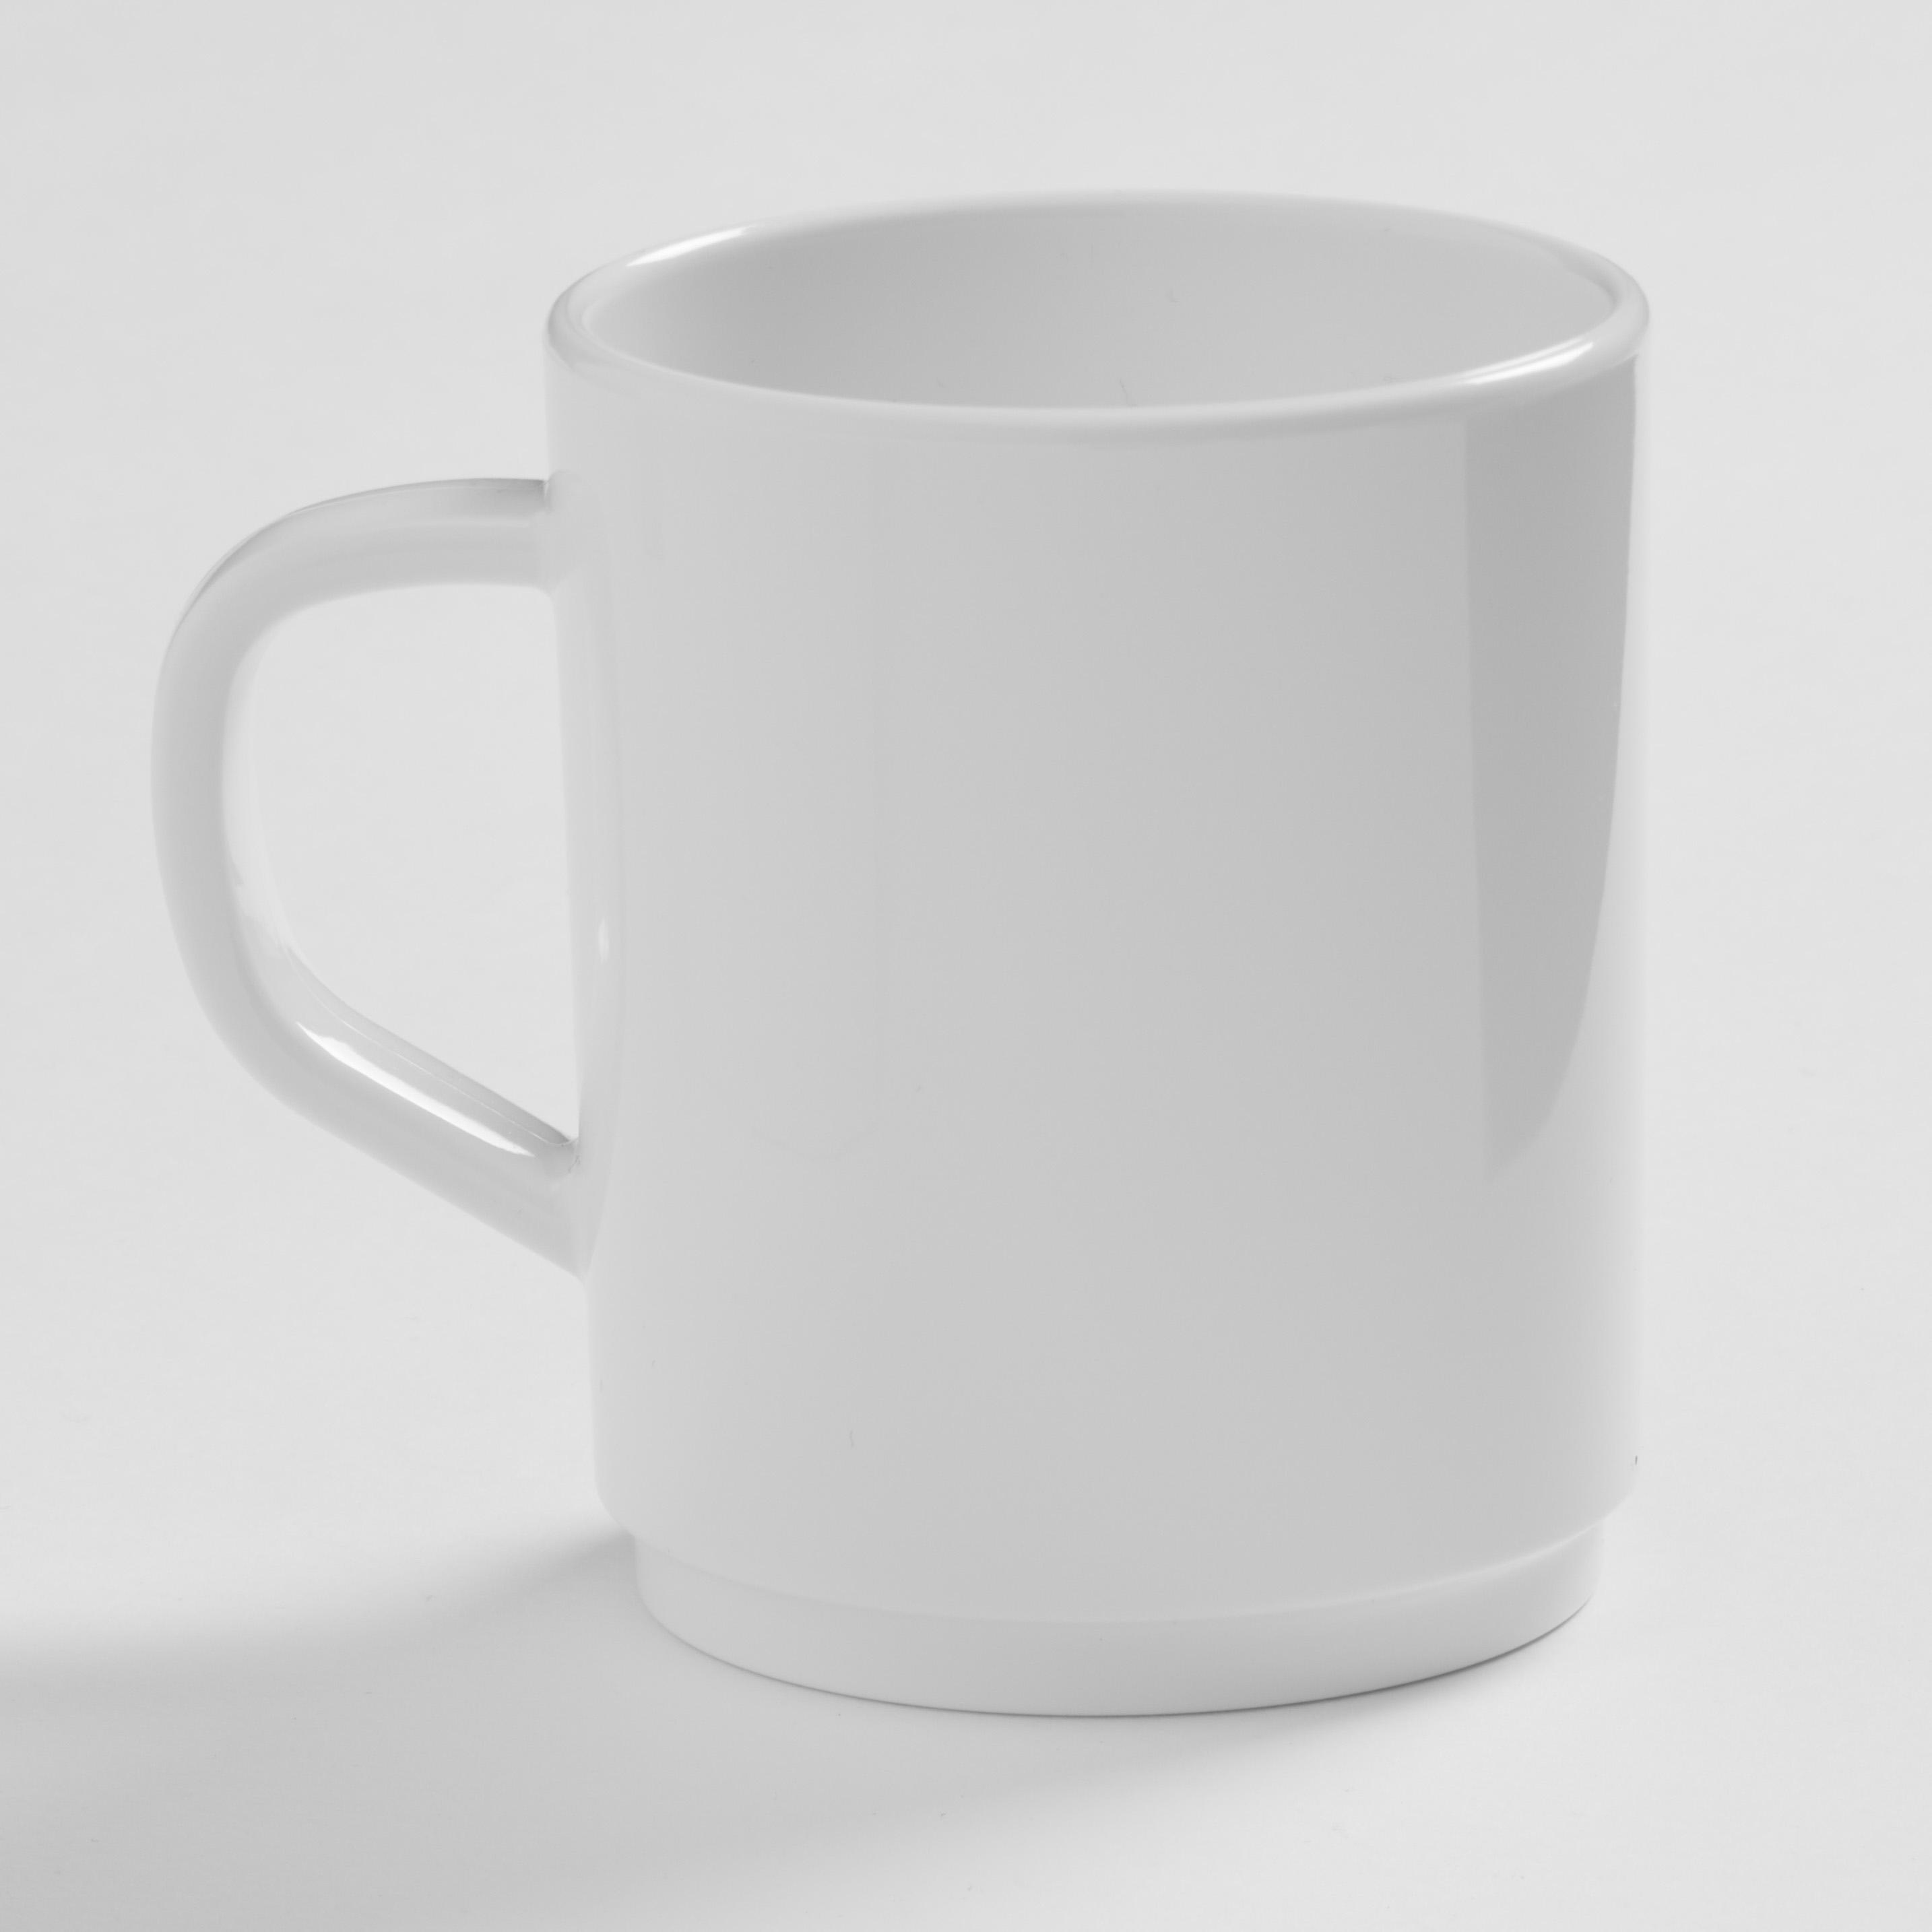 American Metalcraft DM10WH mug, plastic